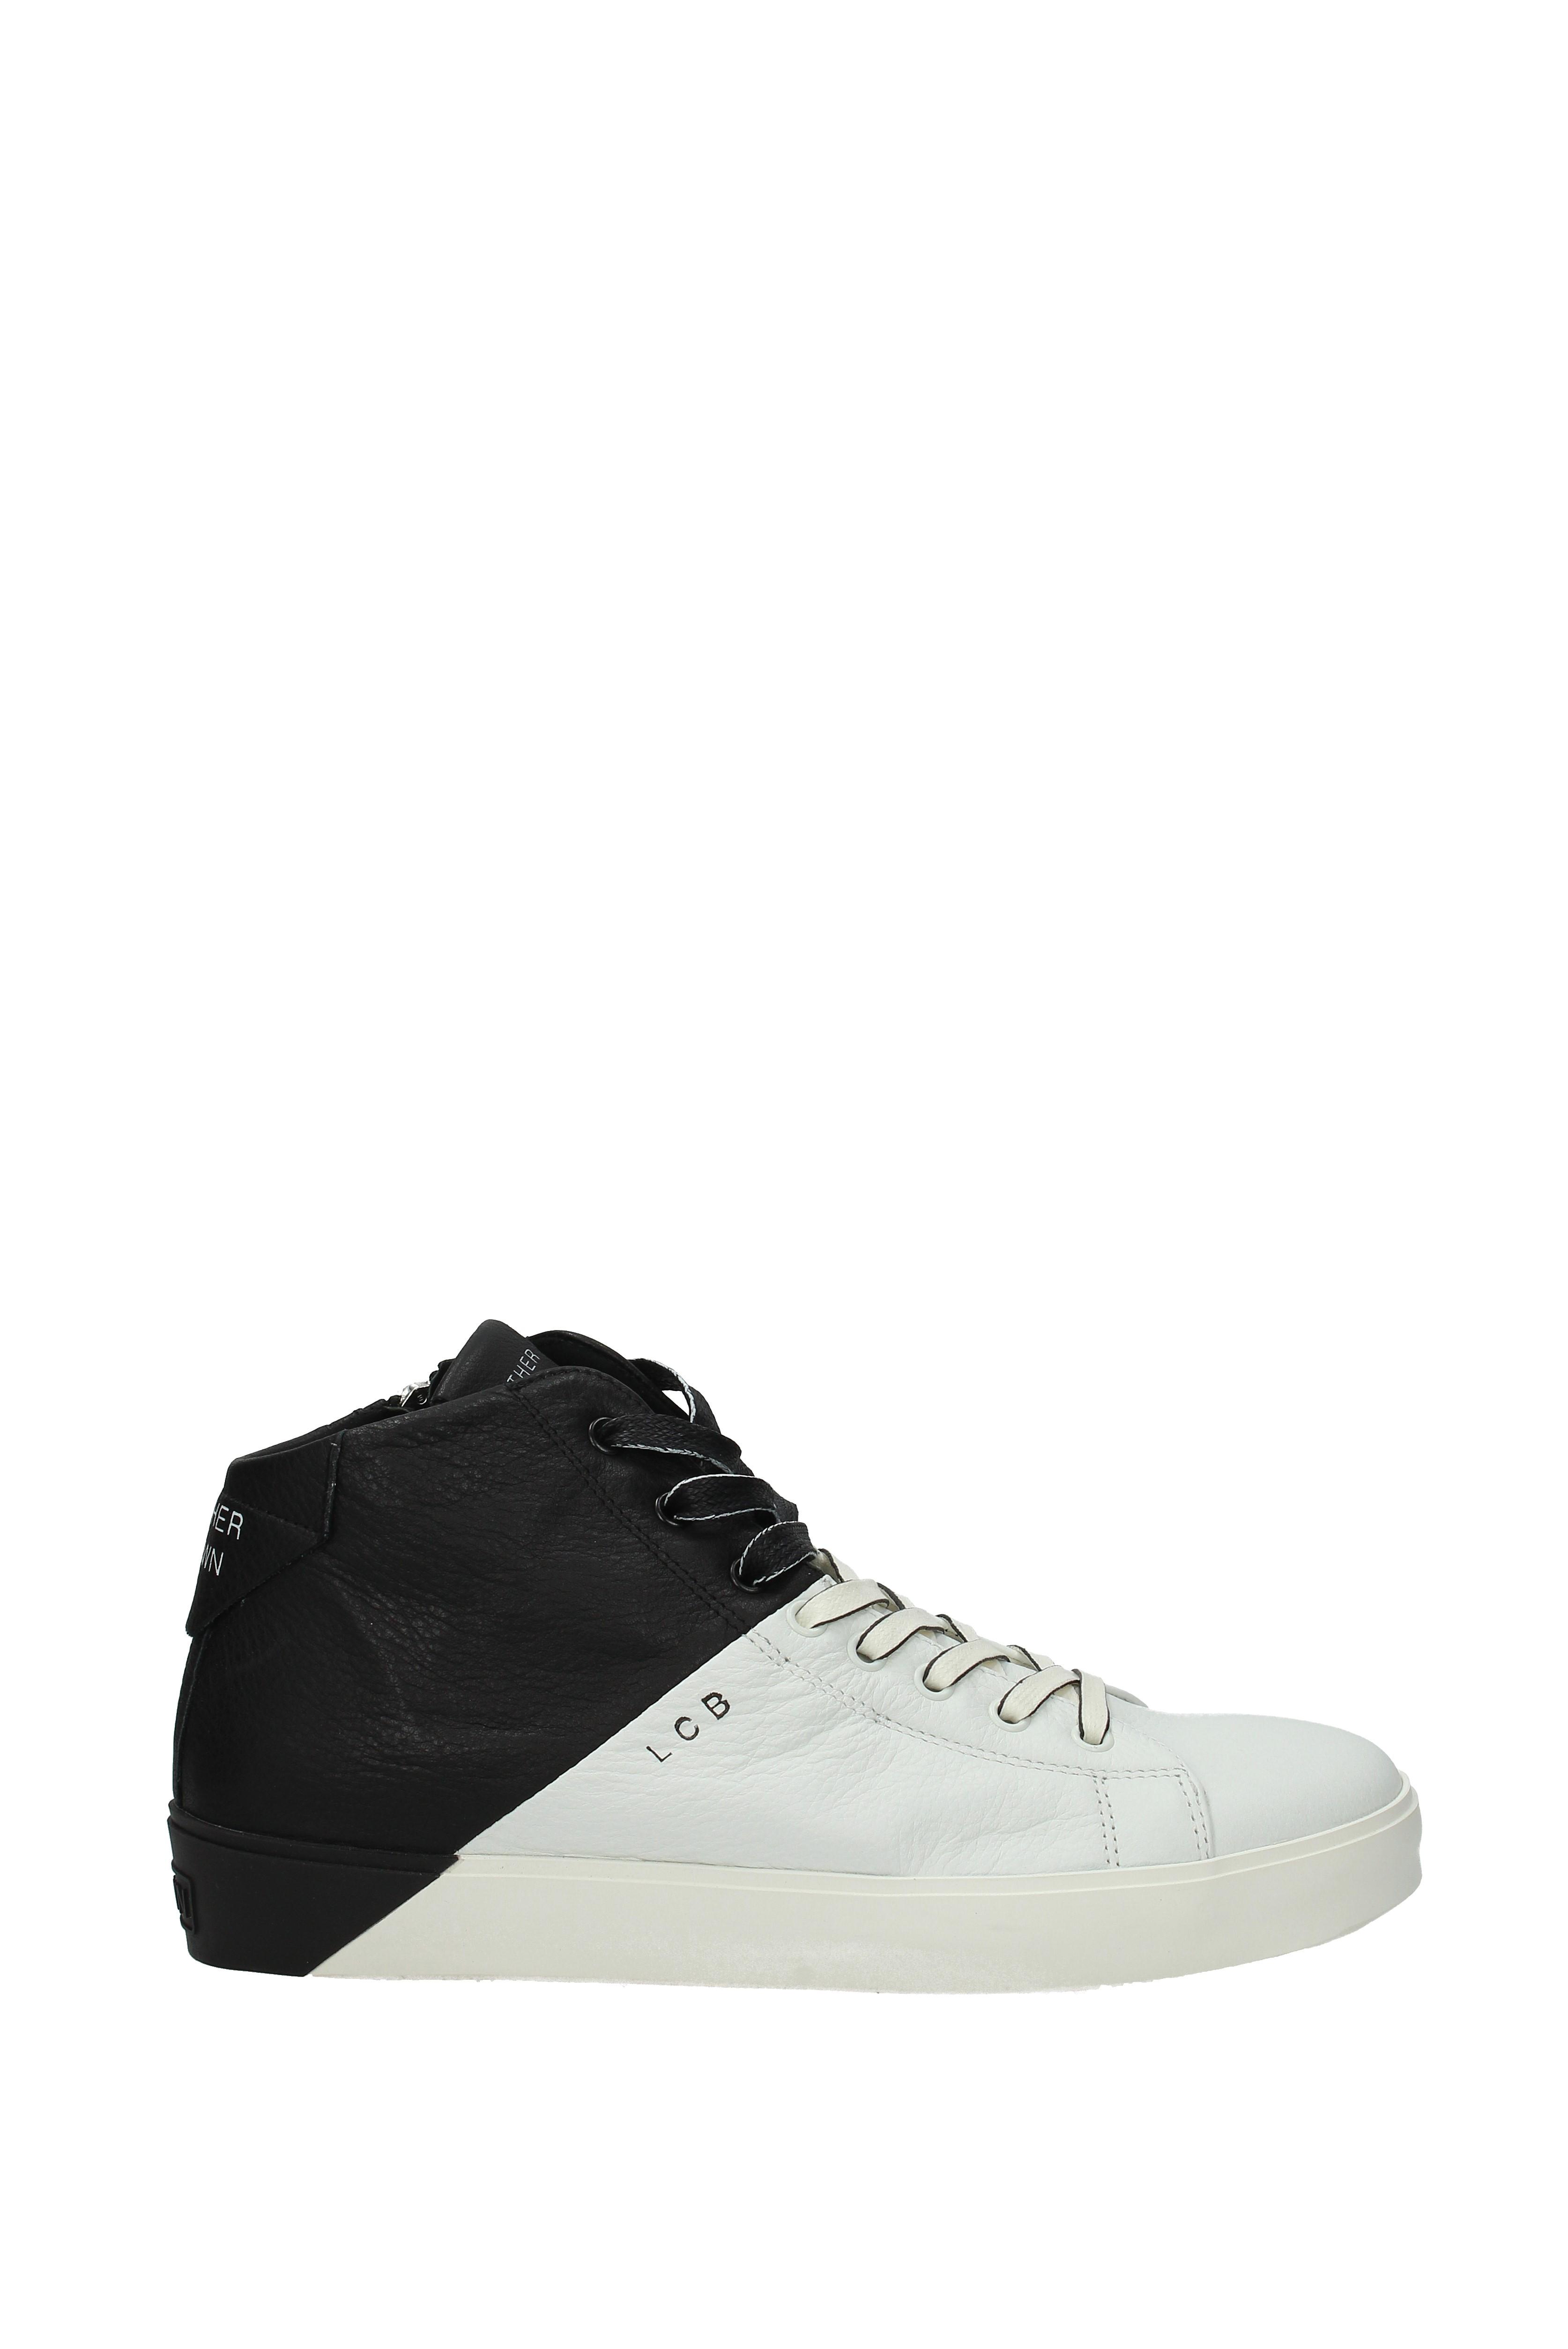 Sneakers Leder Leder Crown Herren - Leder Sneakers (MICONIC5) 98f60a